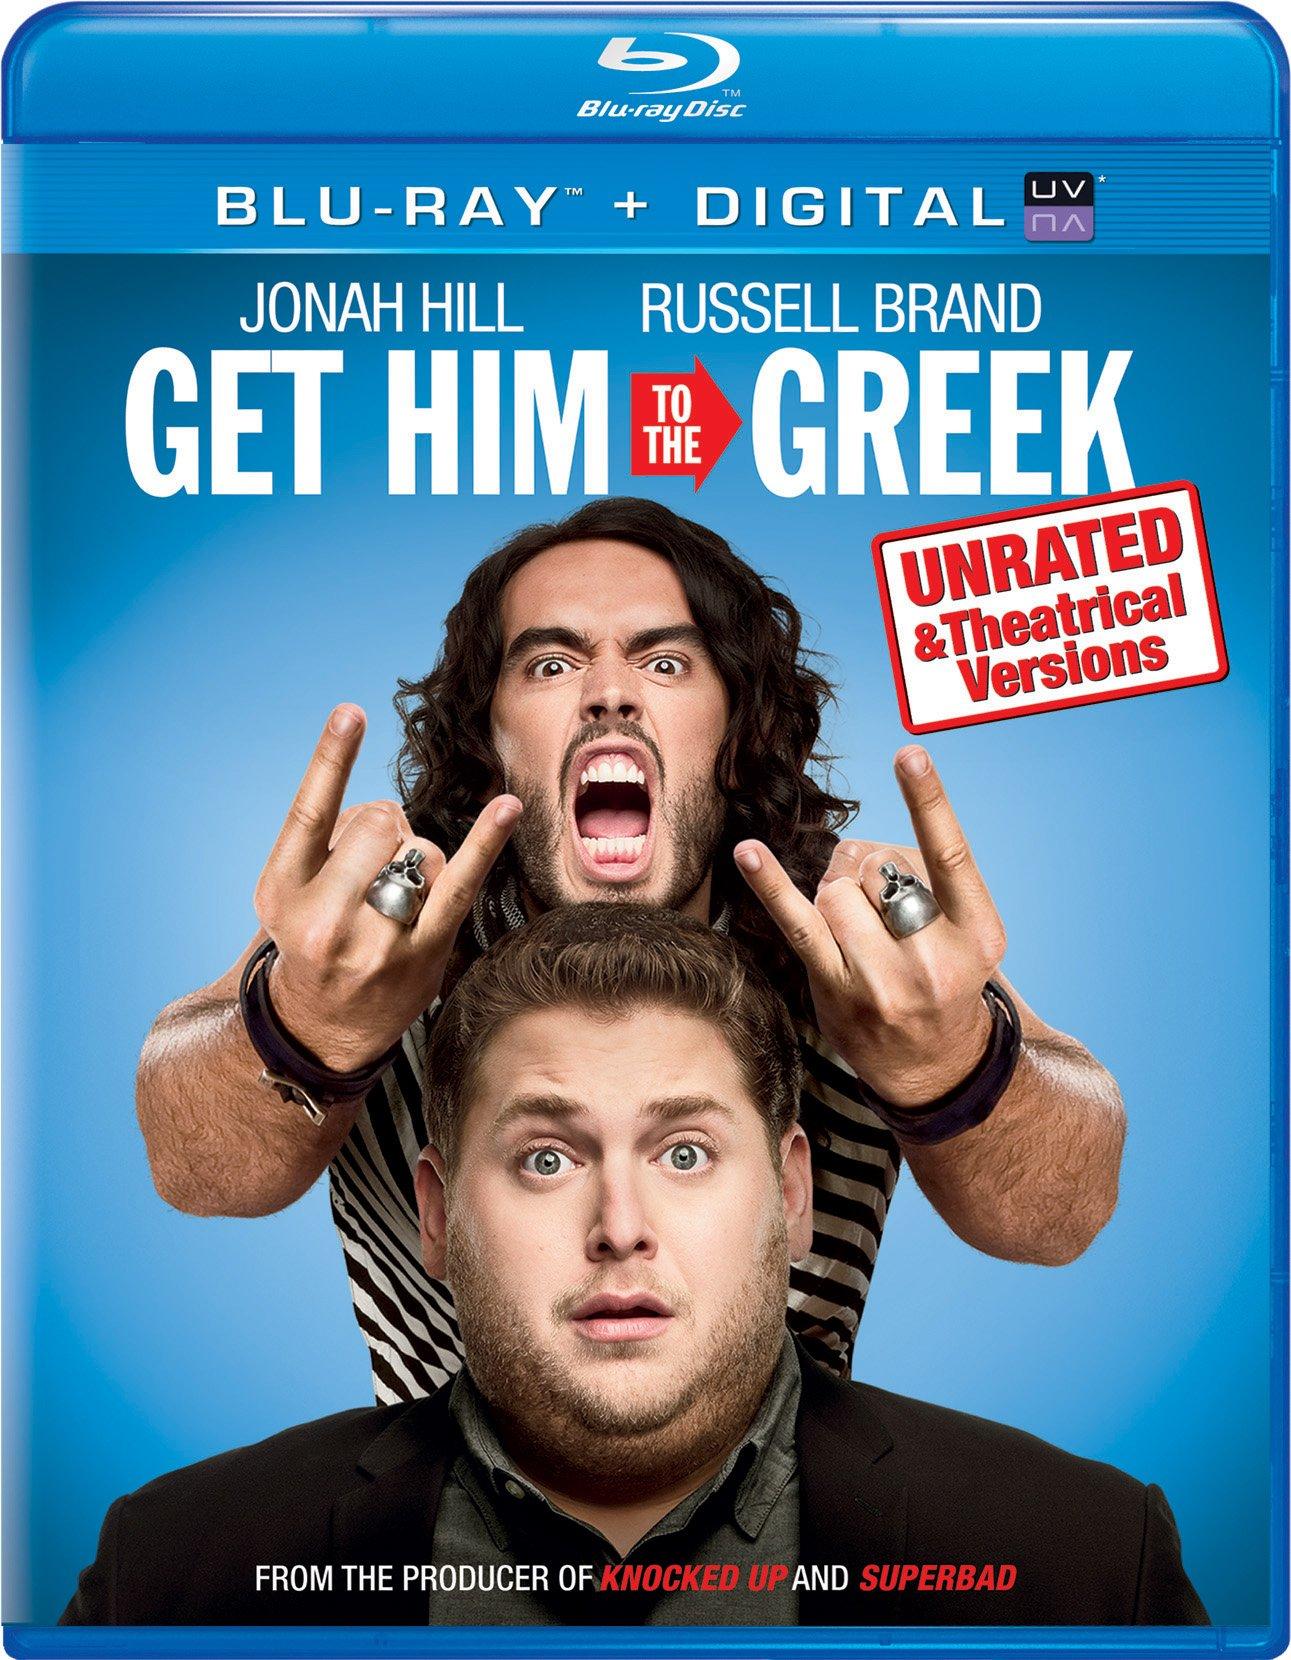 Blu-ray : Get Him to the Greek (Ultraviolet Digital Copy, Digital Copy, Snap Case)